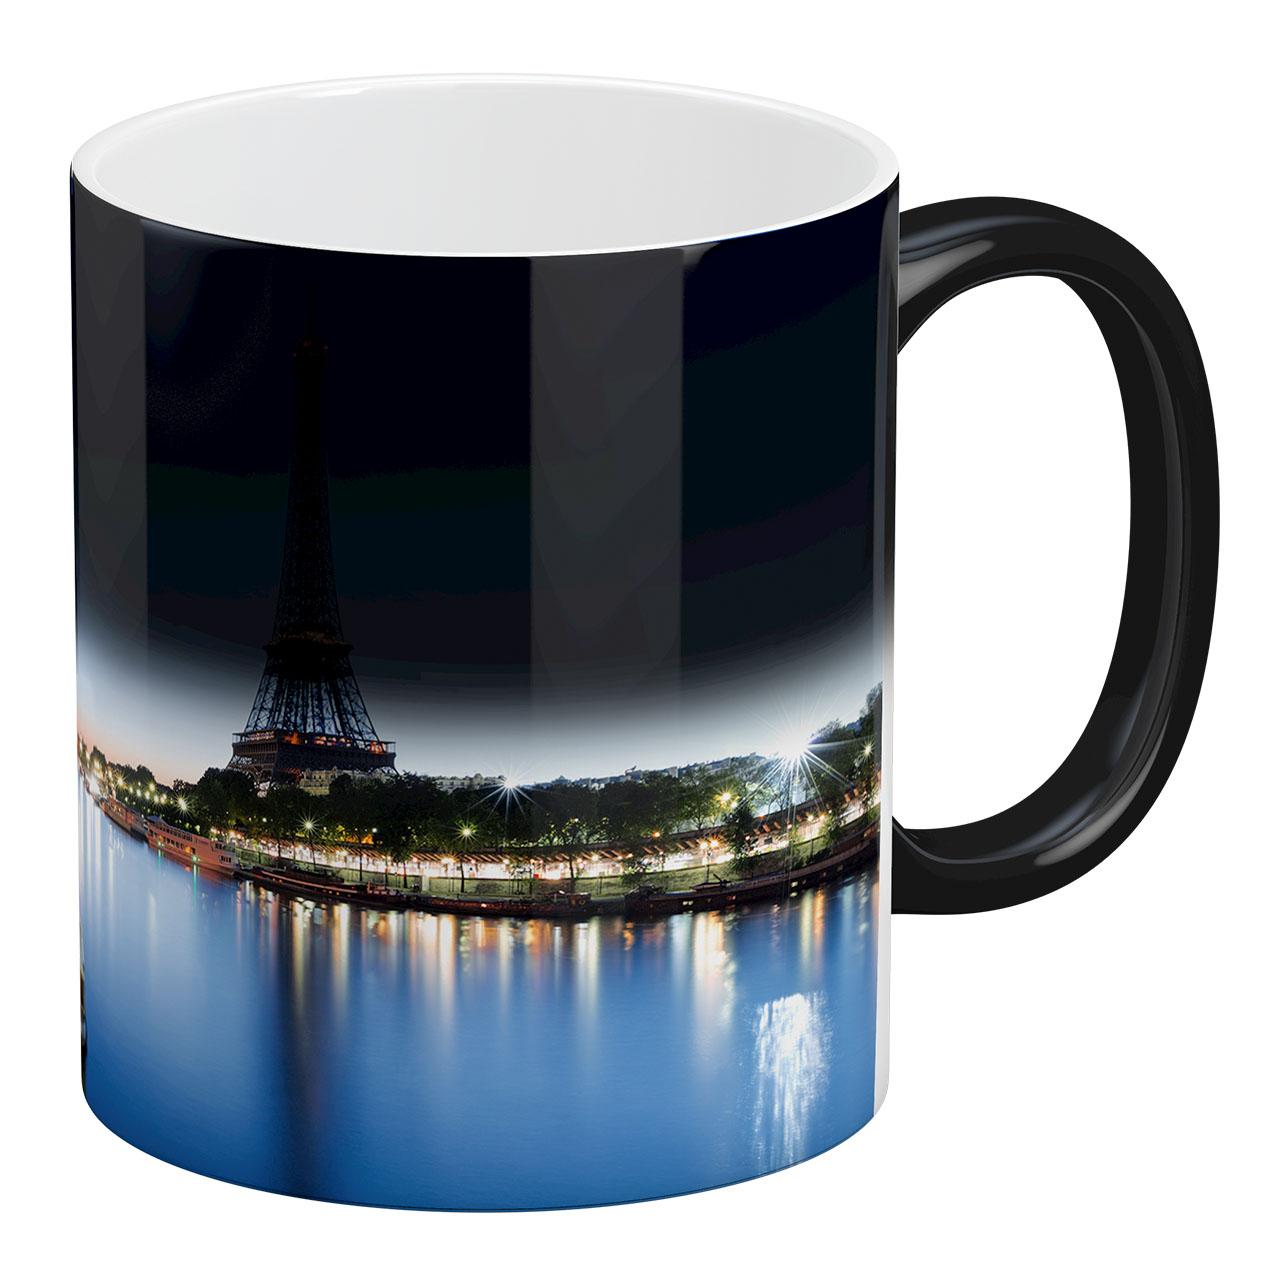 ماگ حرارتی آبنبات رنگی طرح پاریس - برج ایفل  کد ARM0250